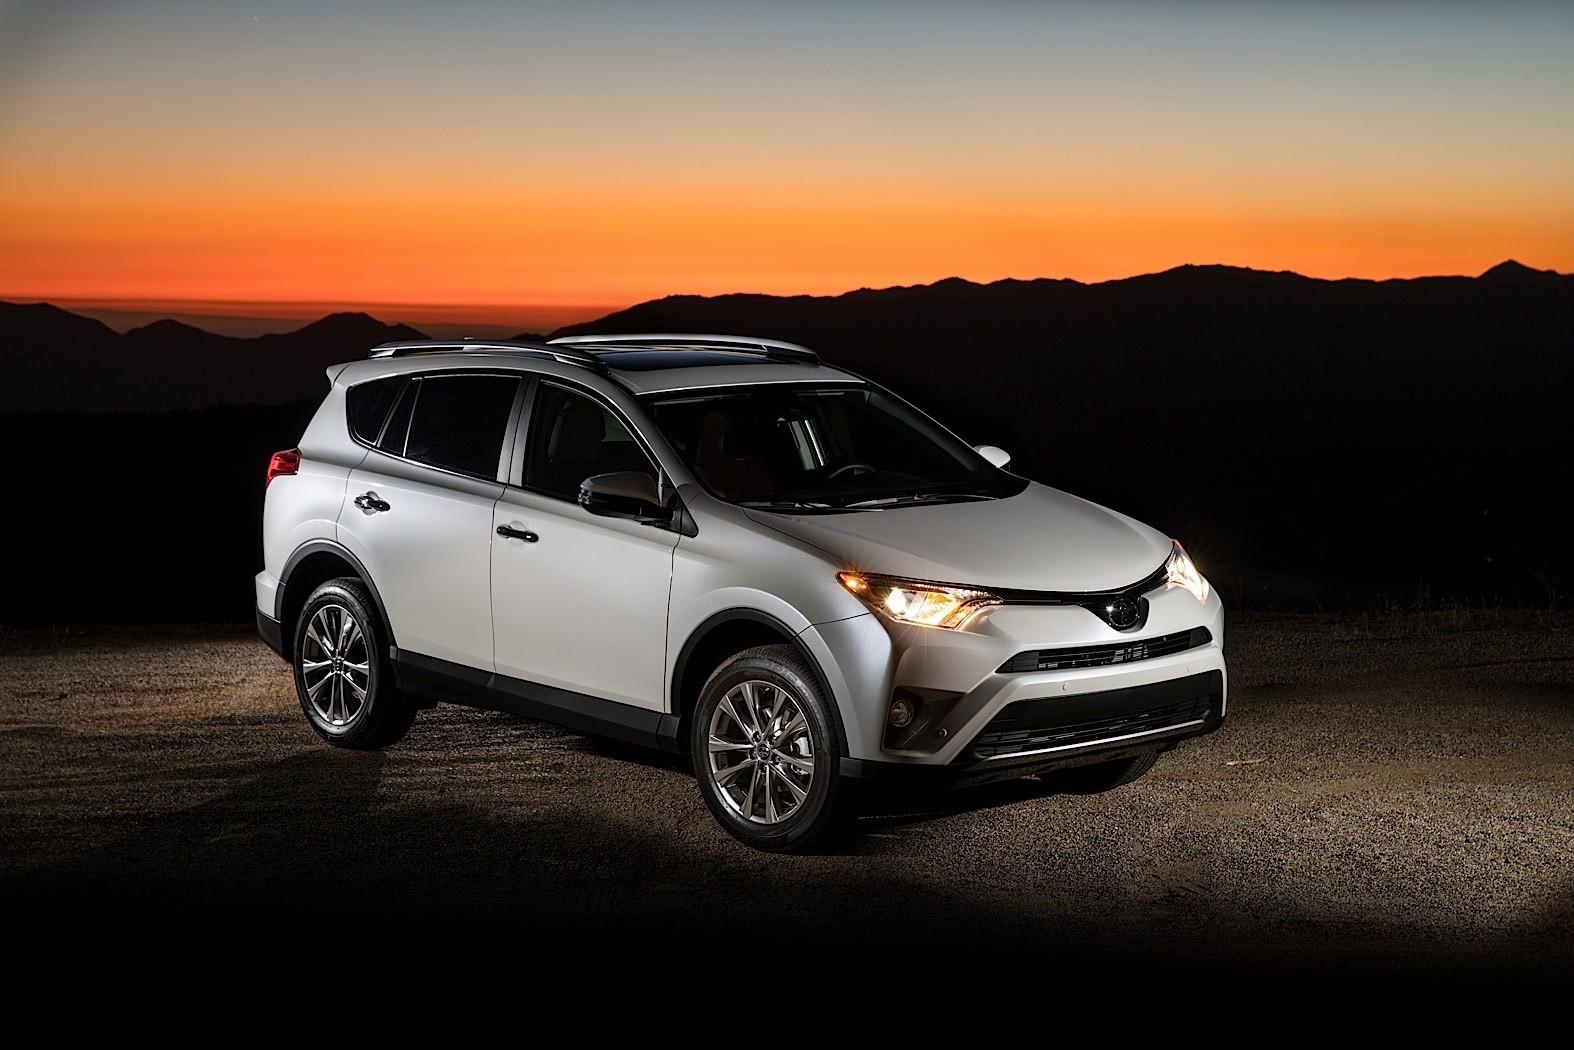 Top 10 Safest SUVs on the US Market in 2016 - autoevolution